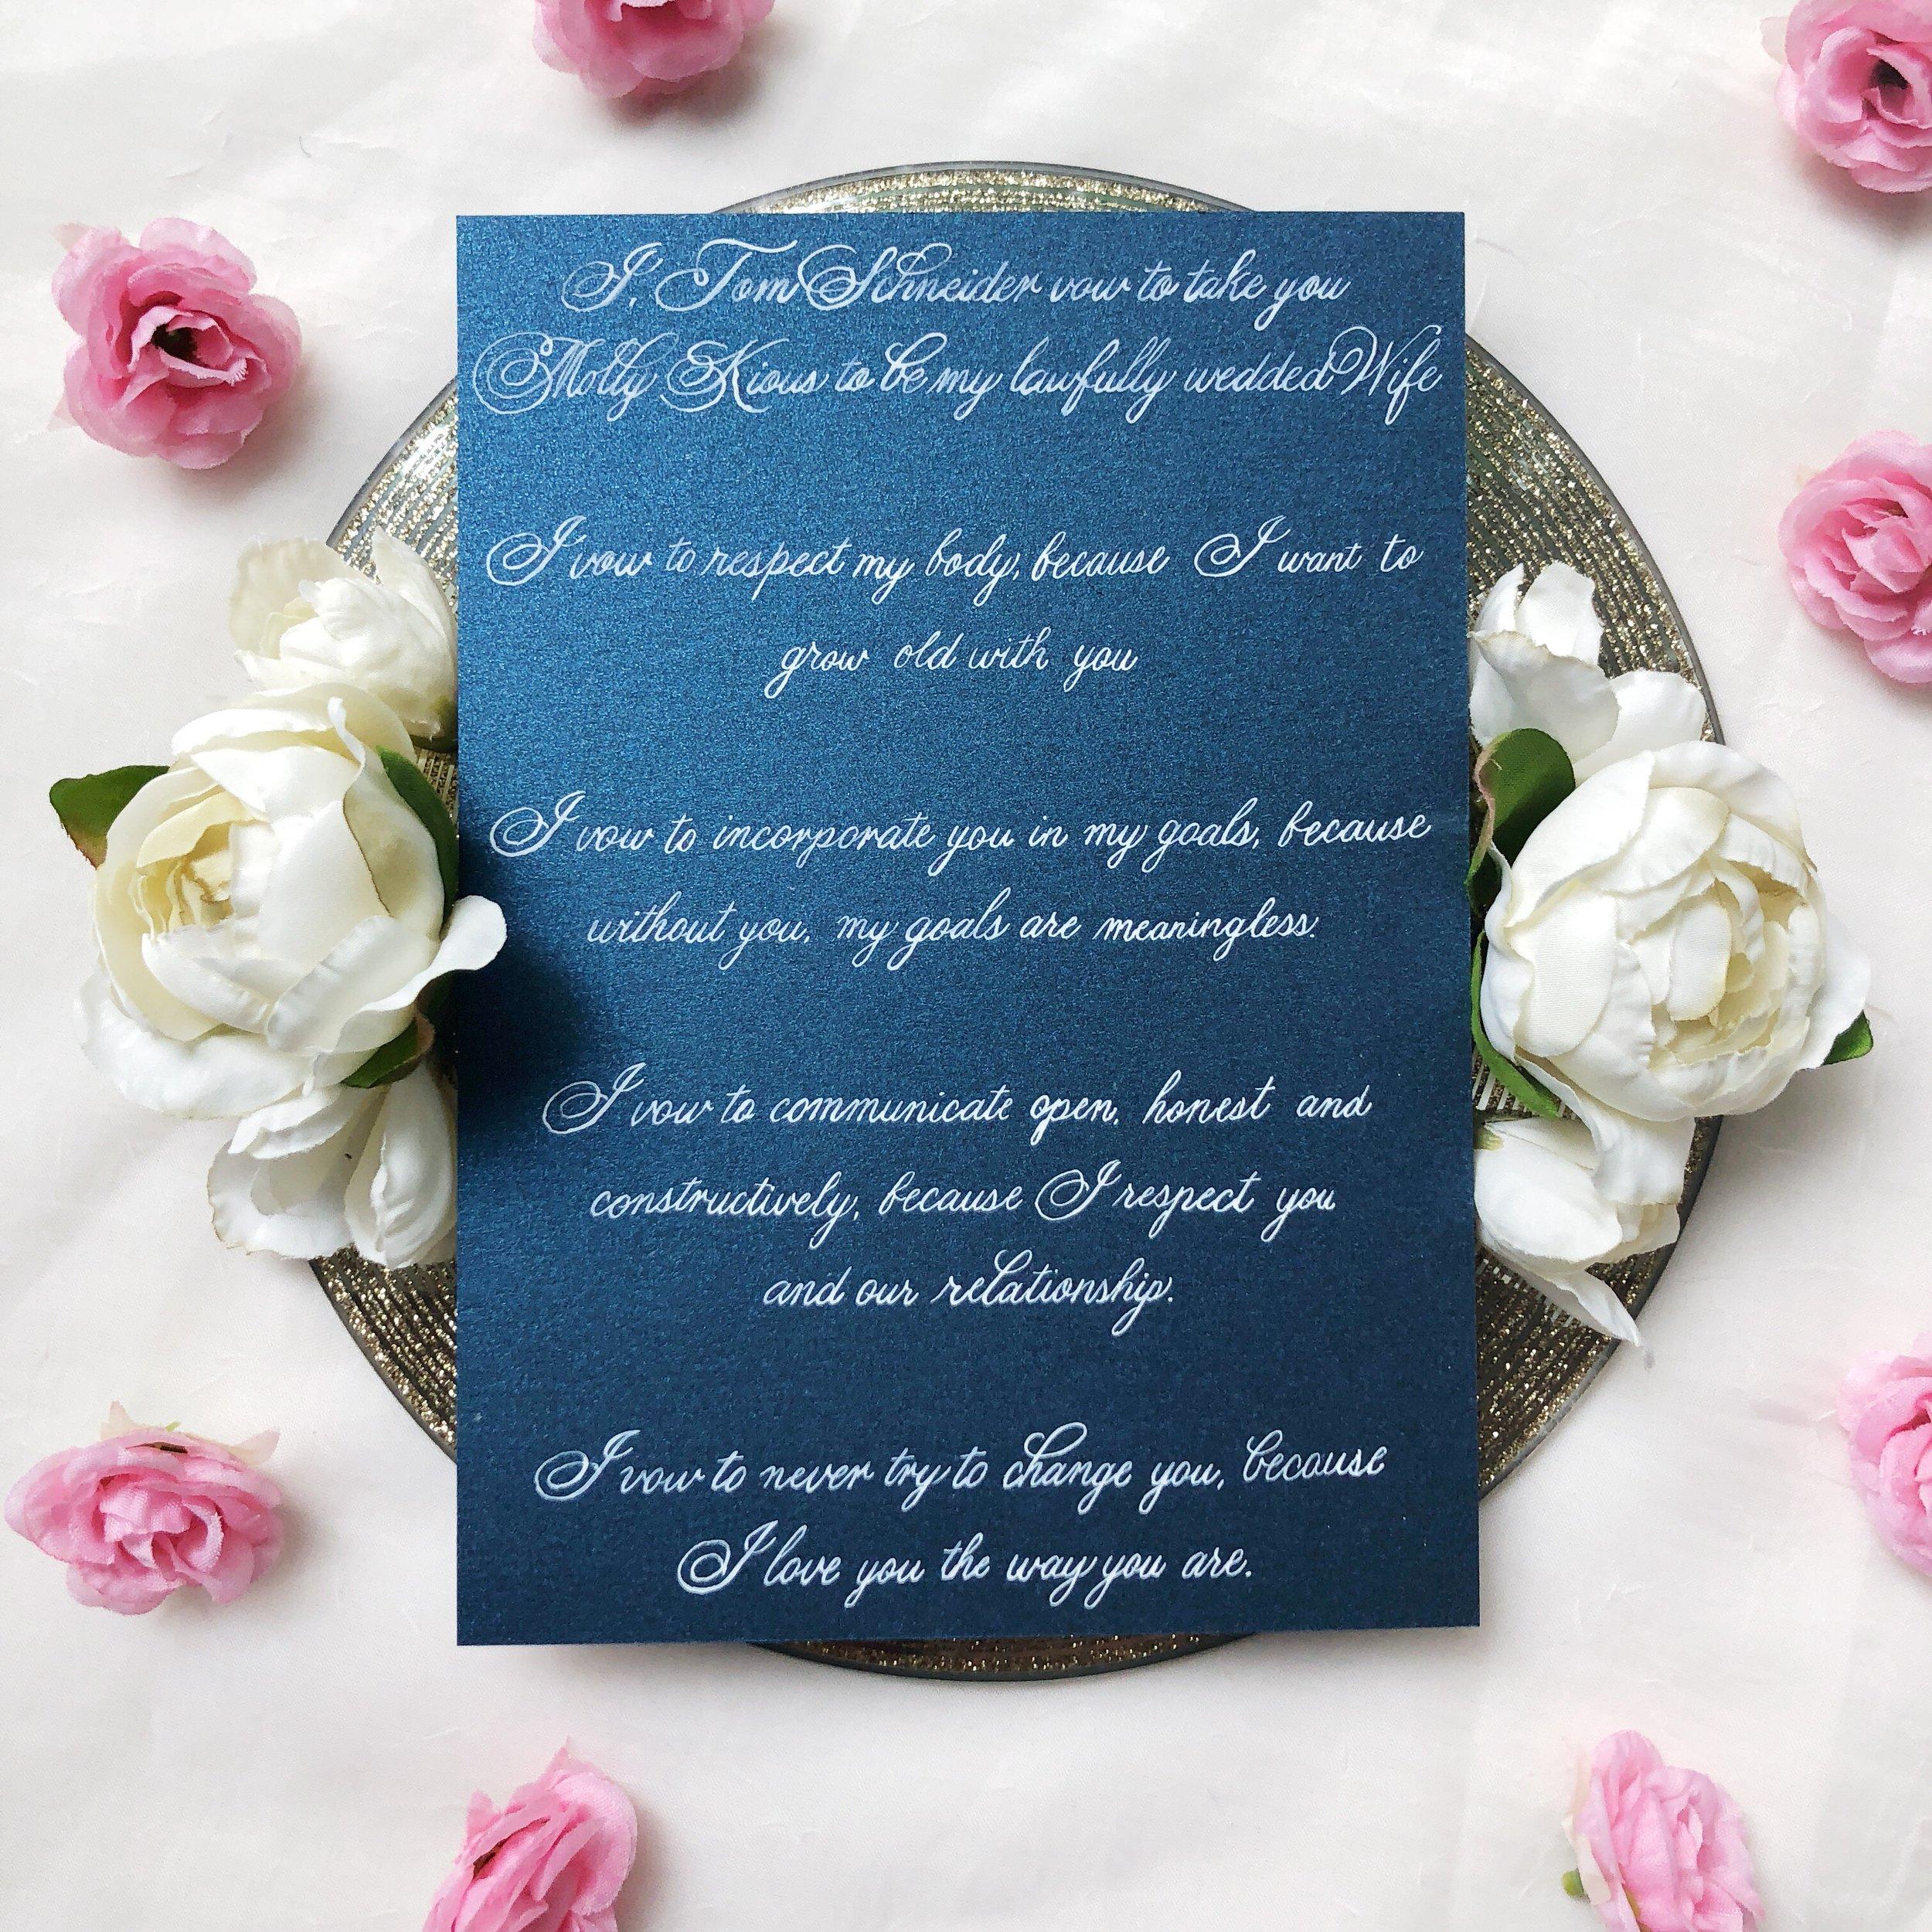 Central PA, York PA, JesSmith Designs, custom, wedding, invitations, bridal, Harrisburg, hanover, calligraphy, baltimore, wedding invitations, lancaster, gettysburg, 07-25 10.20.27.jpg